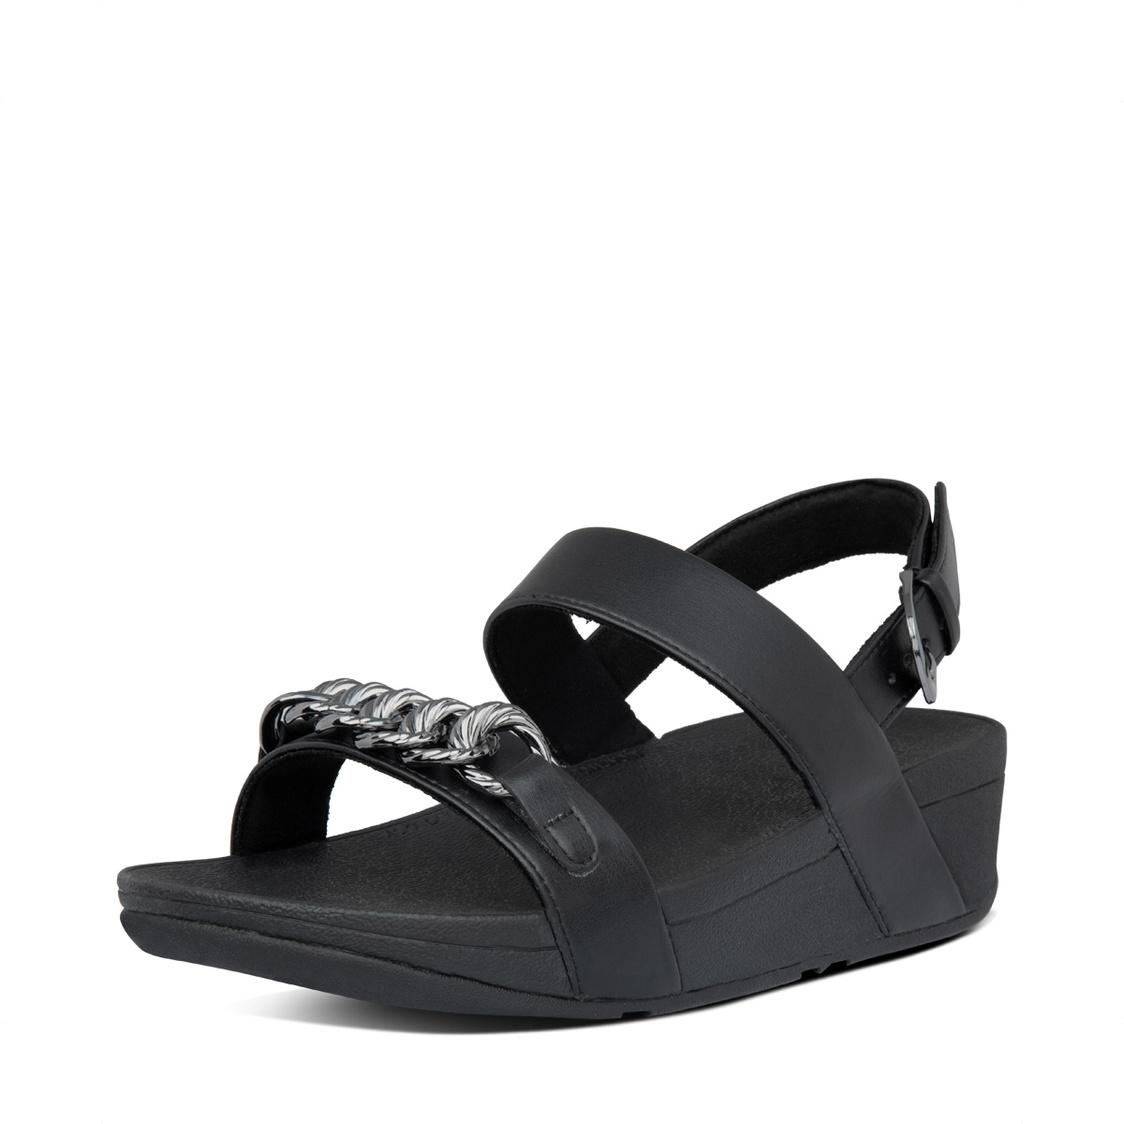 FitFlop Lottie Chain Back-Strap Sandals All Black